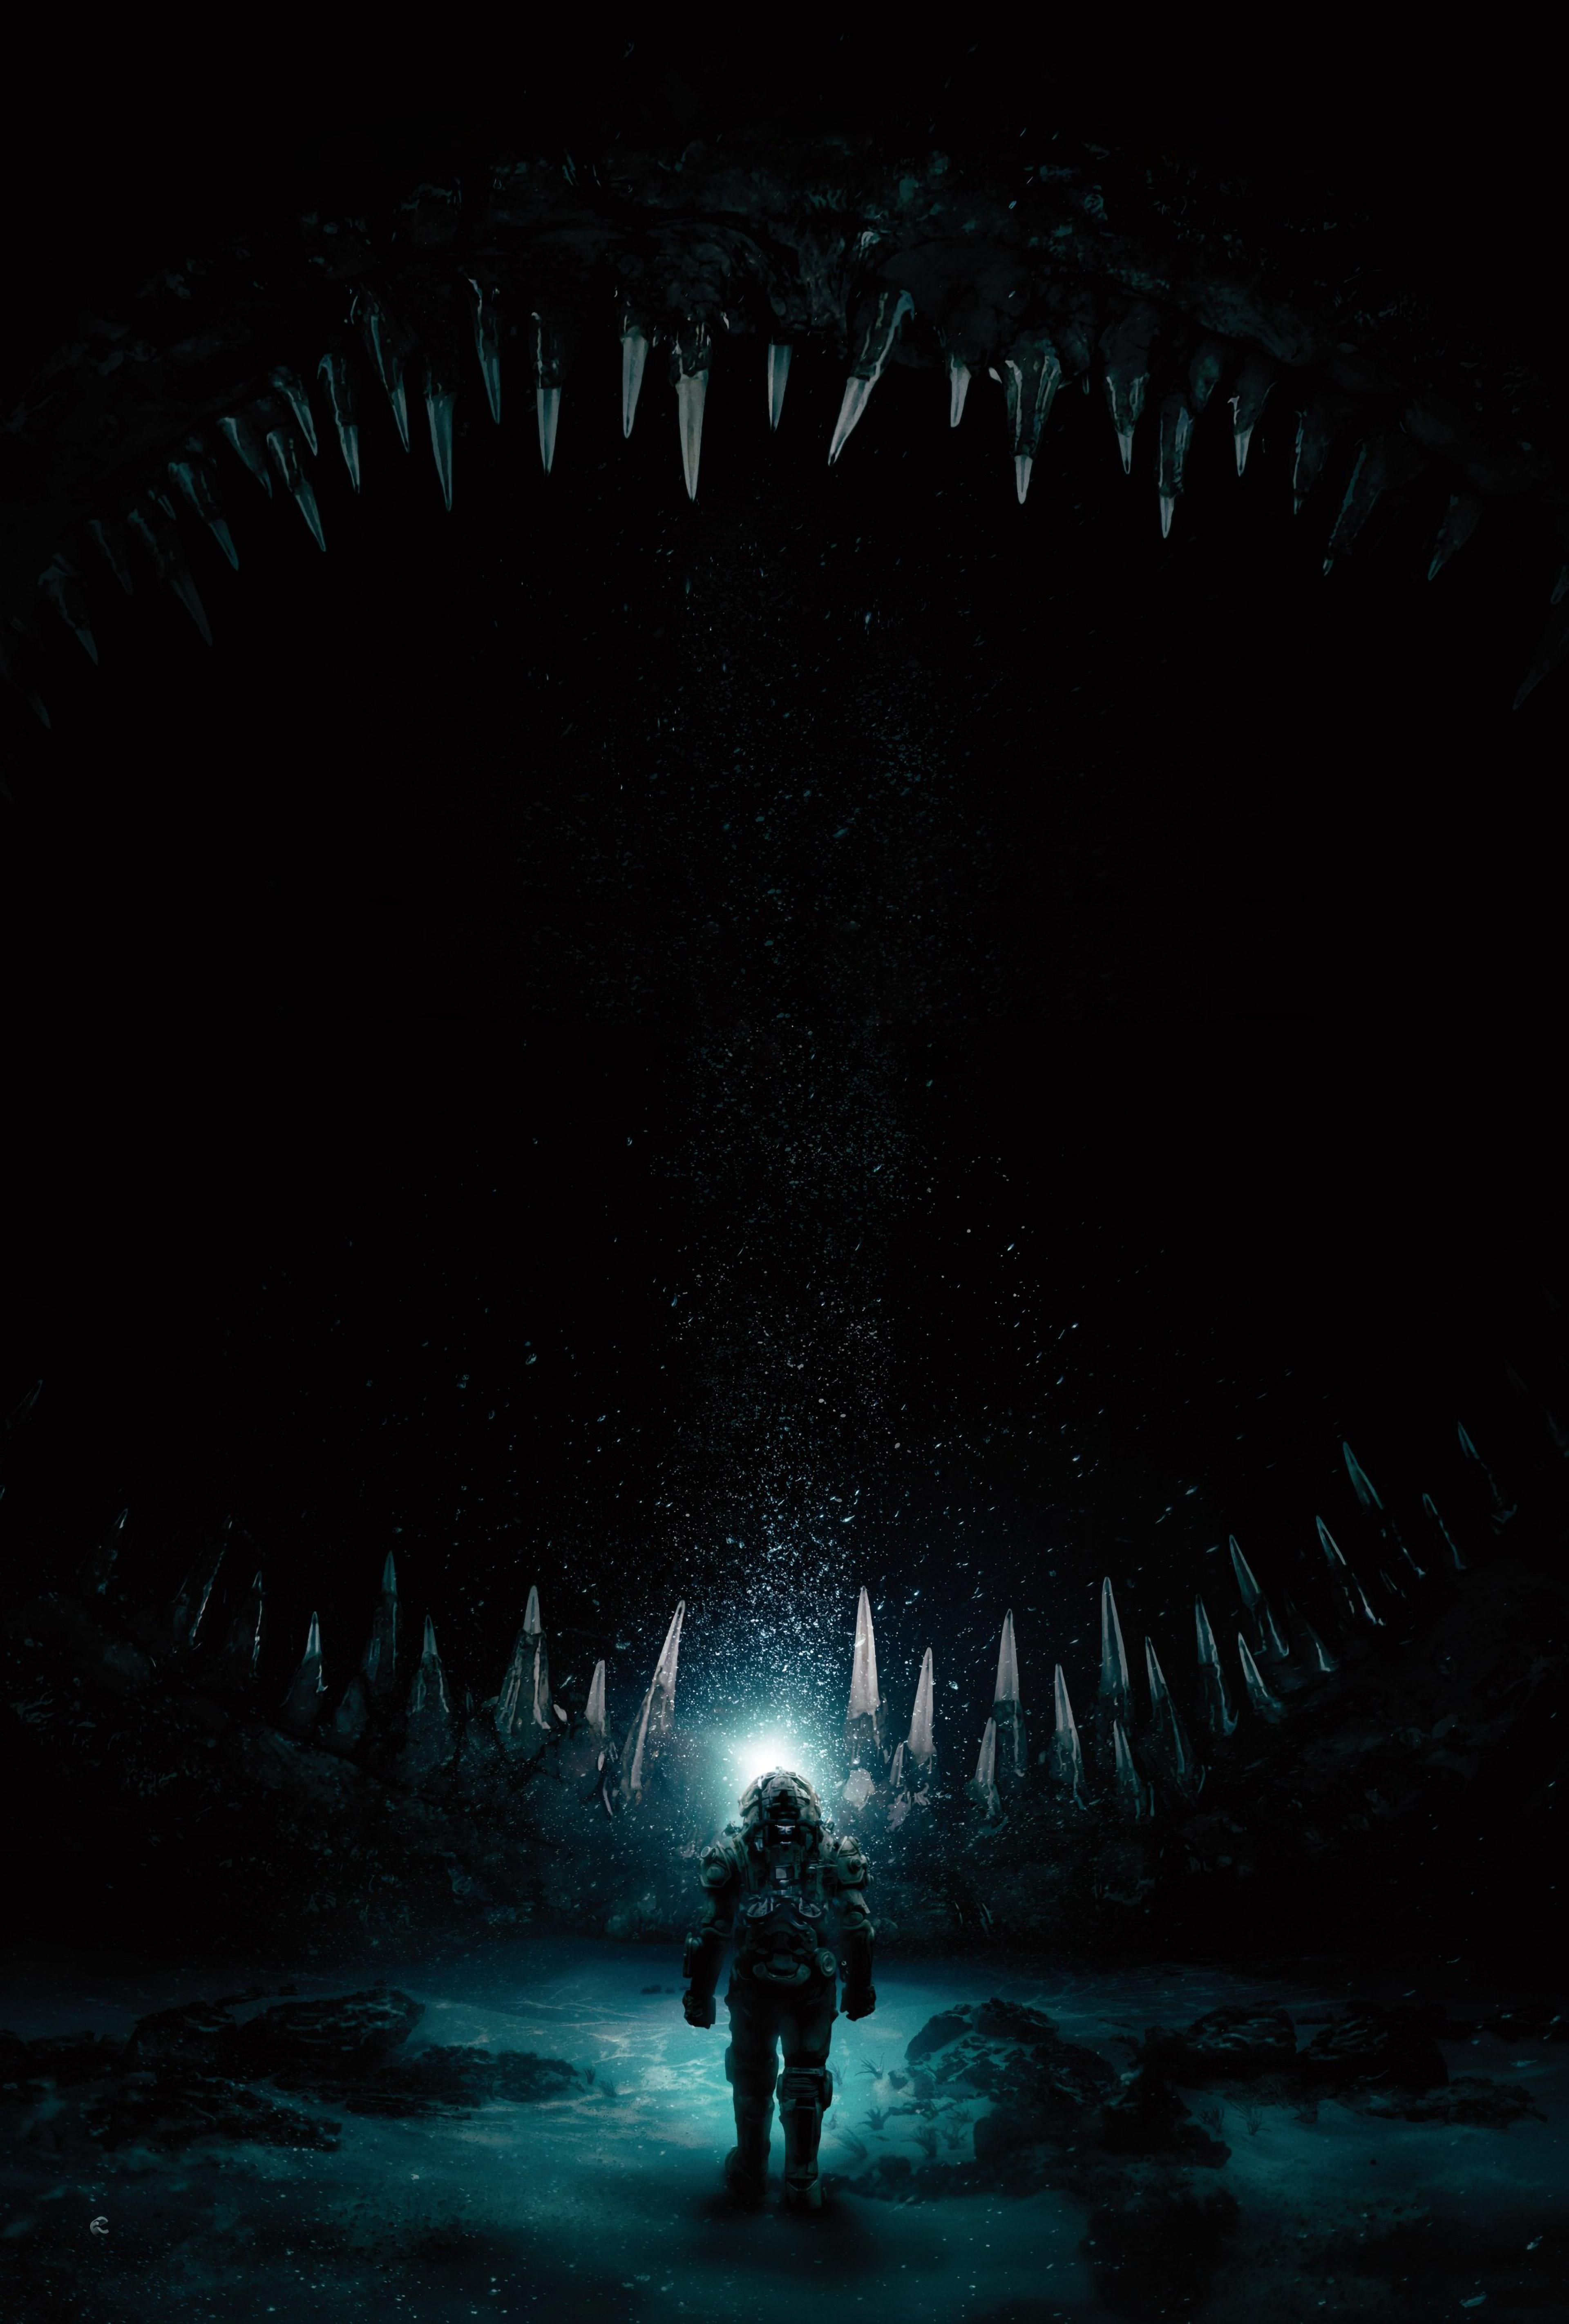 Underwater Movie 2020 Wallpapers Wallpaper Cave